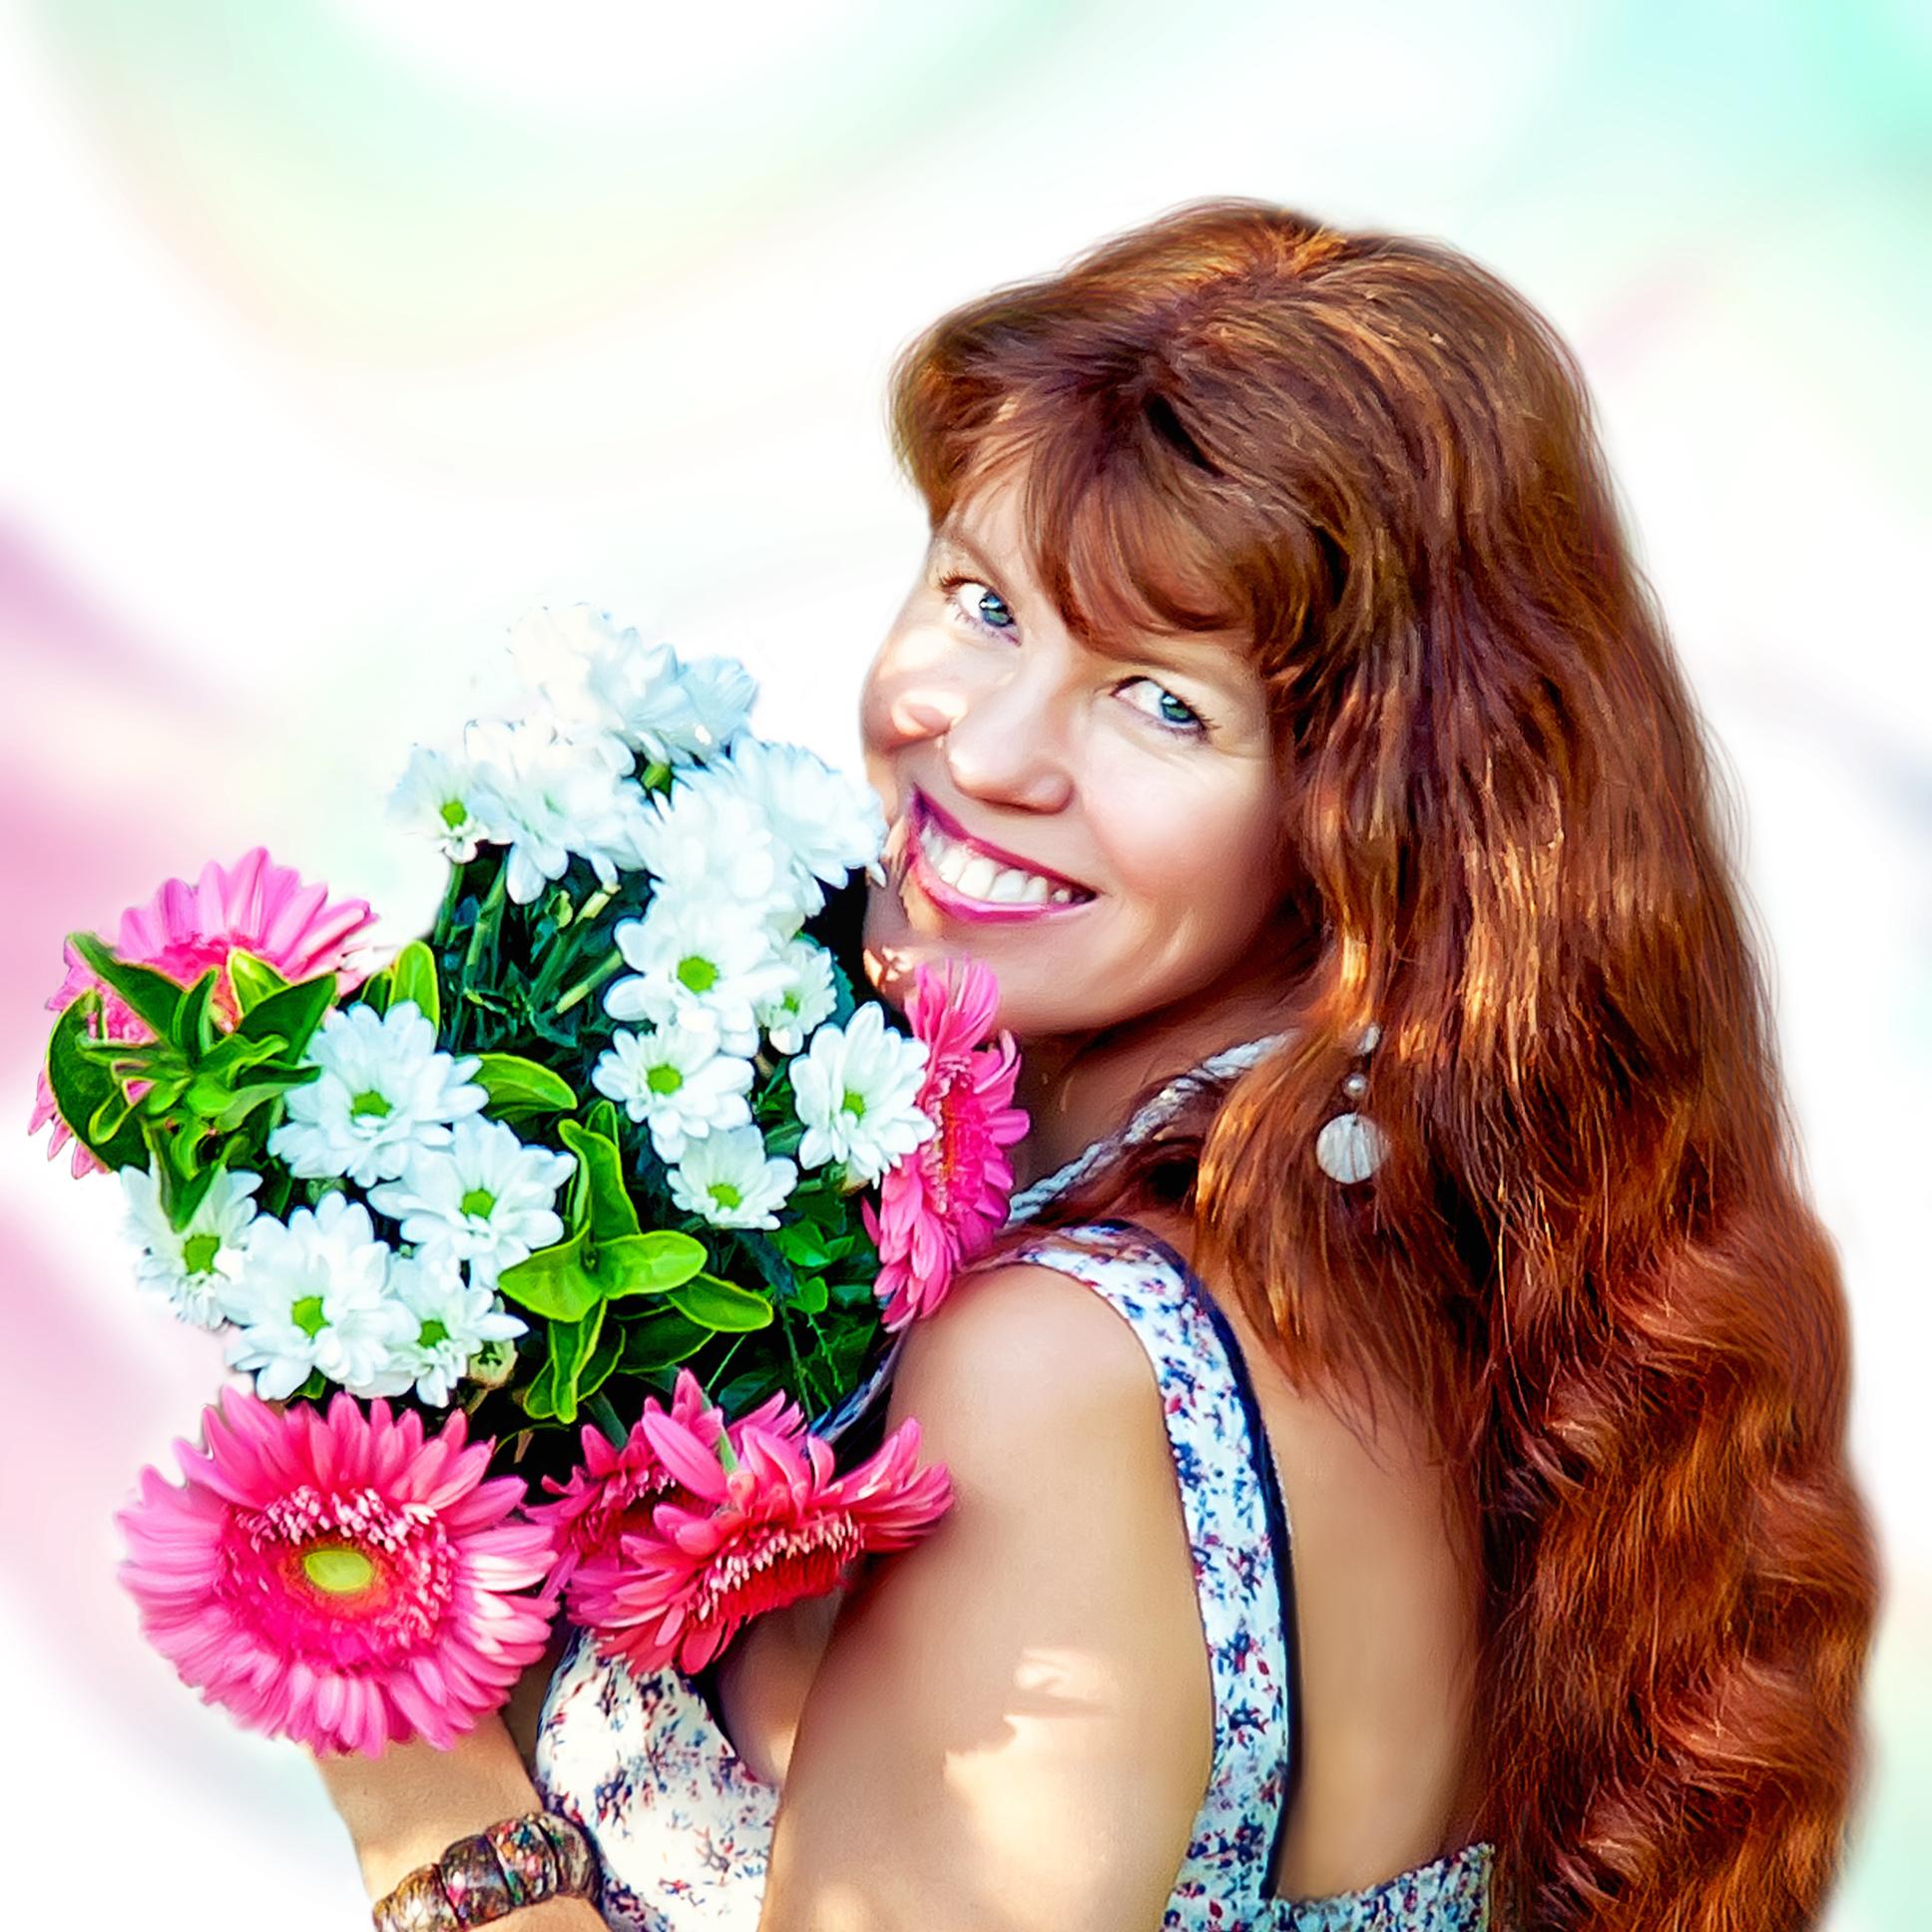 Wellcome to my creative and colorfull world! - I`m Natalie Maro – graphic designer, photographer, artist.